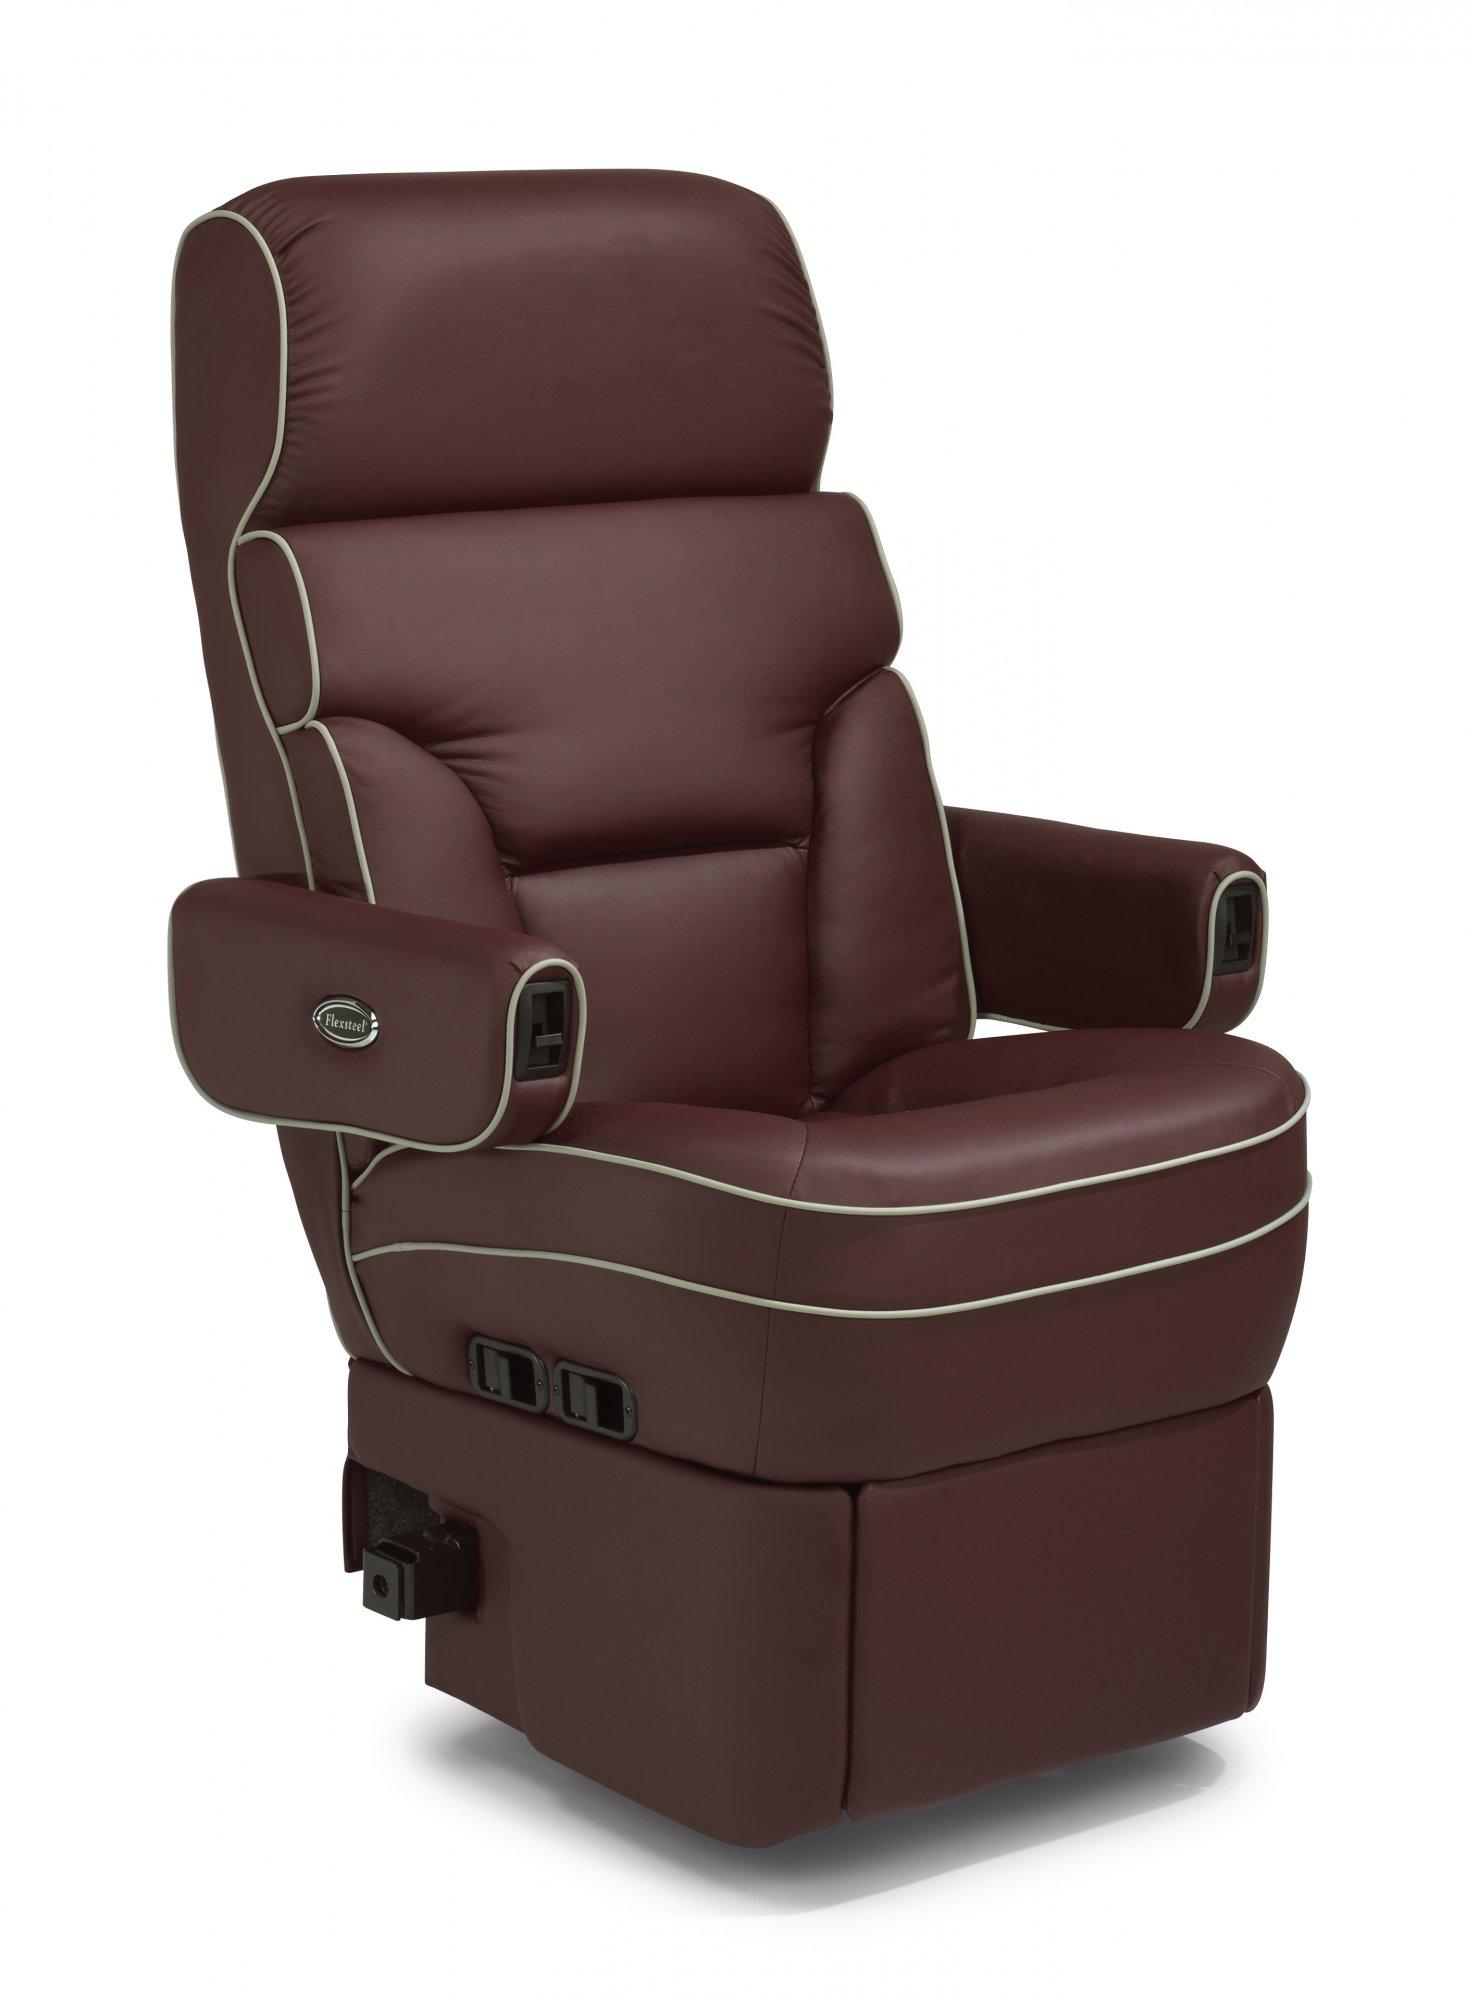 Flexsteel Rv Leather Seat Covers Velcromag